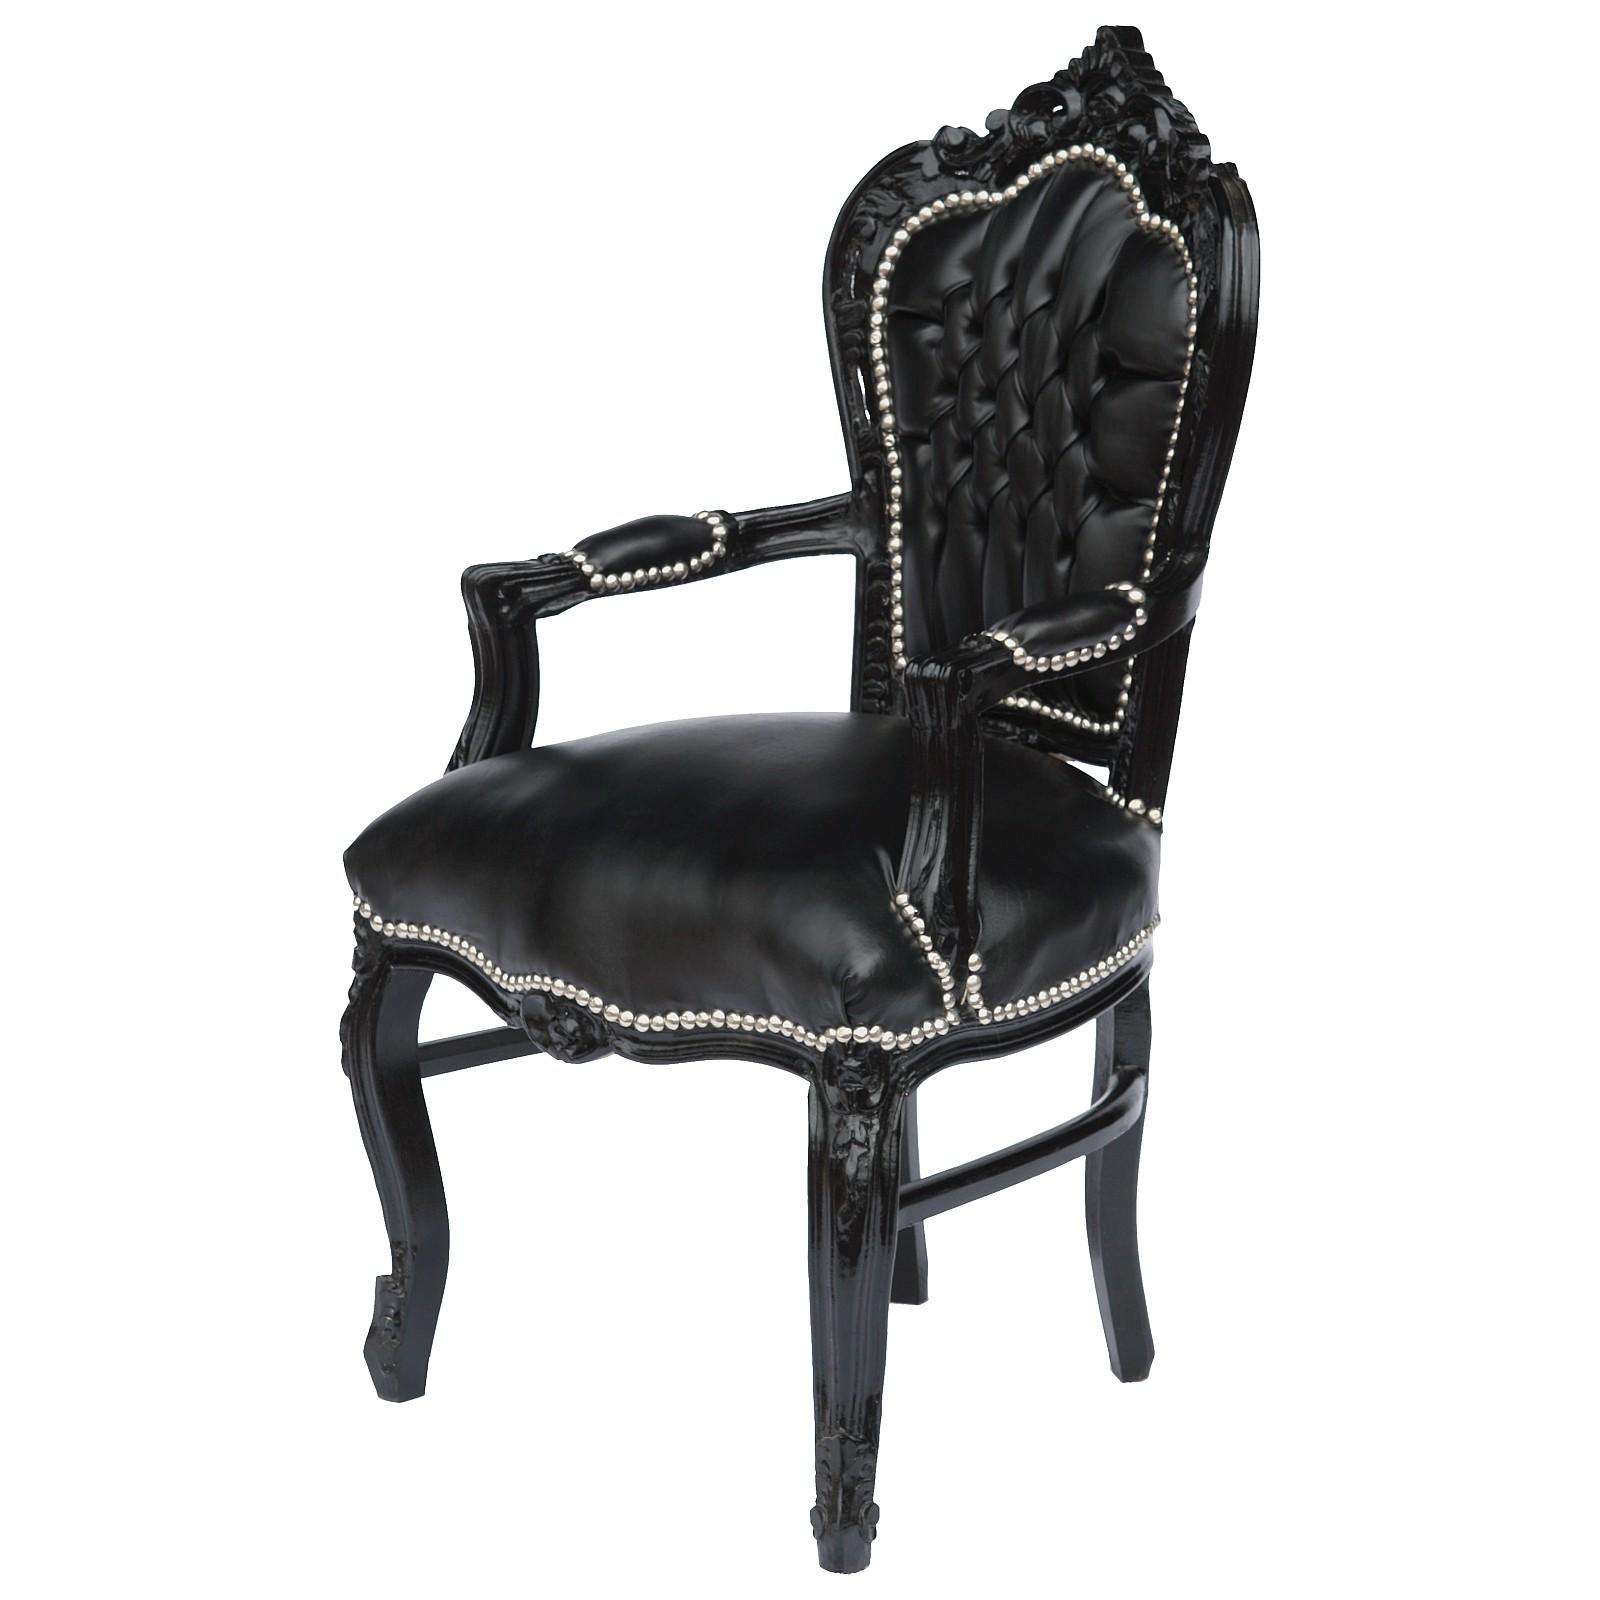 retro armlehnstuhl barock esszimmer gothic style kunstleder holzrahmen schwarz. Black Bedroom Furniture Sets. Home Design Ideas